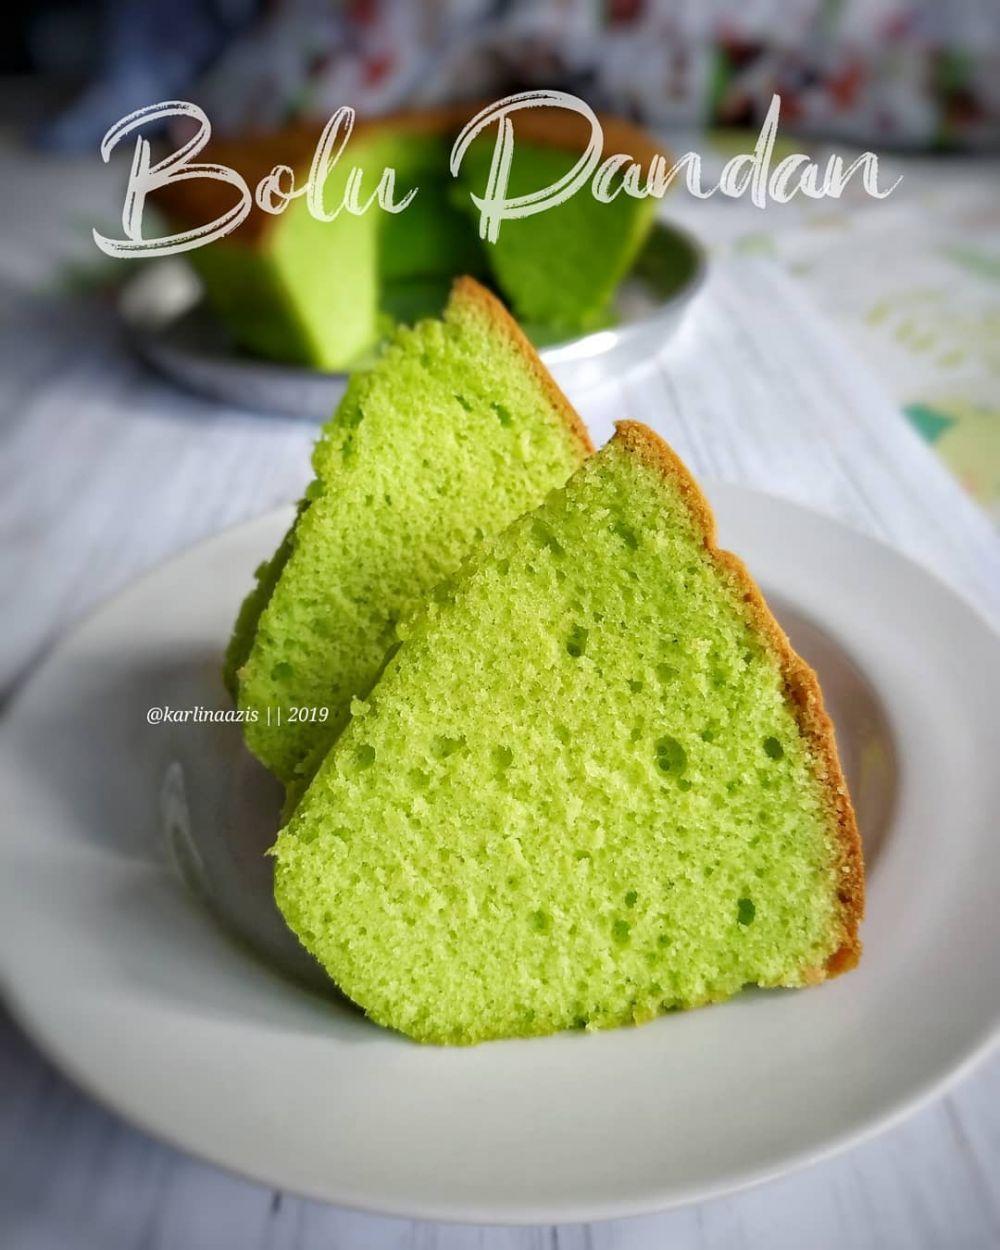 Resep Kue Basah Untuk Lebaran Instagram Resep Kue Kue Kue Tart Buah